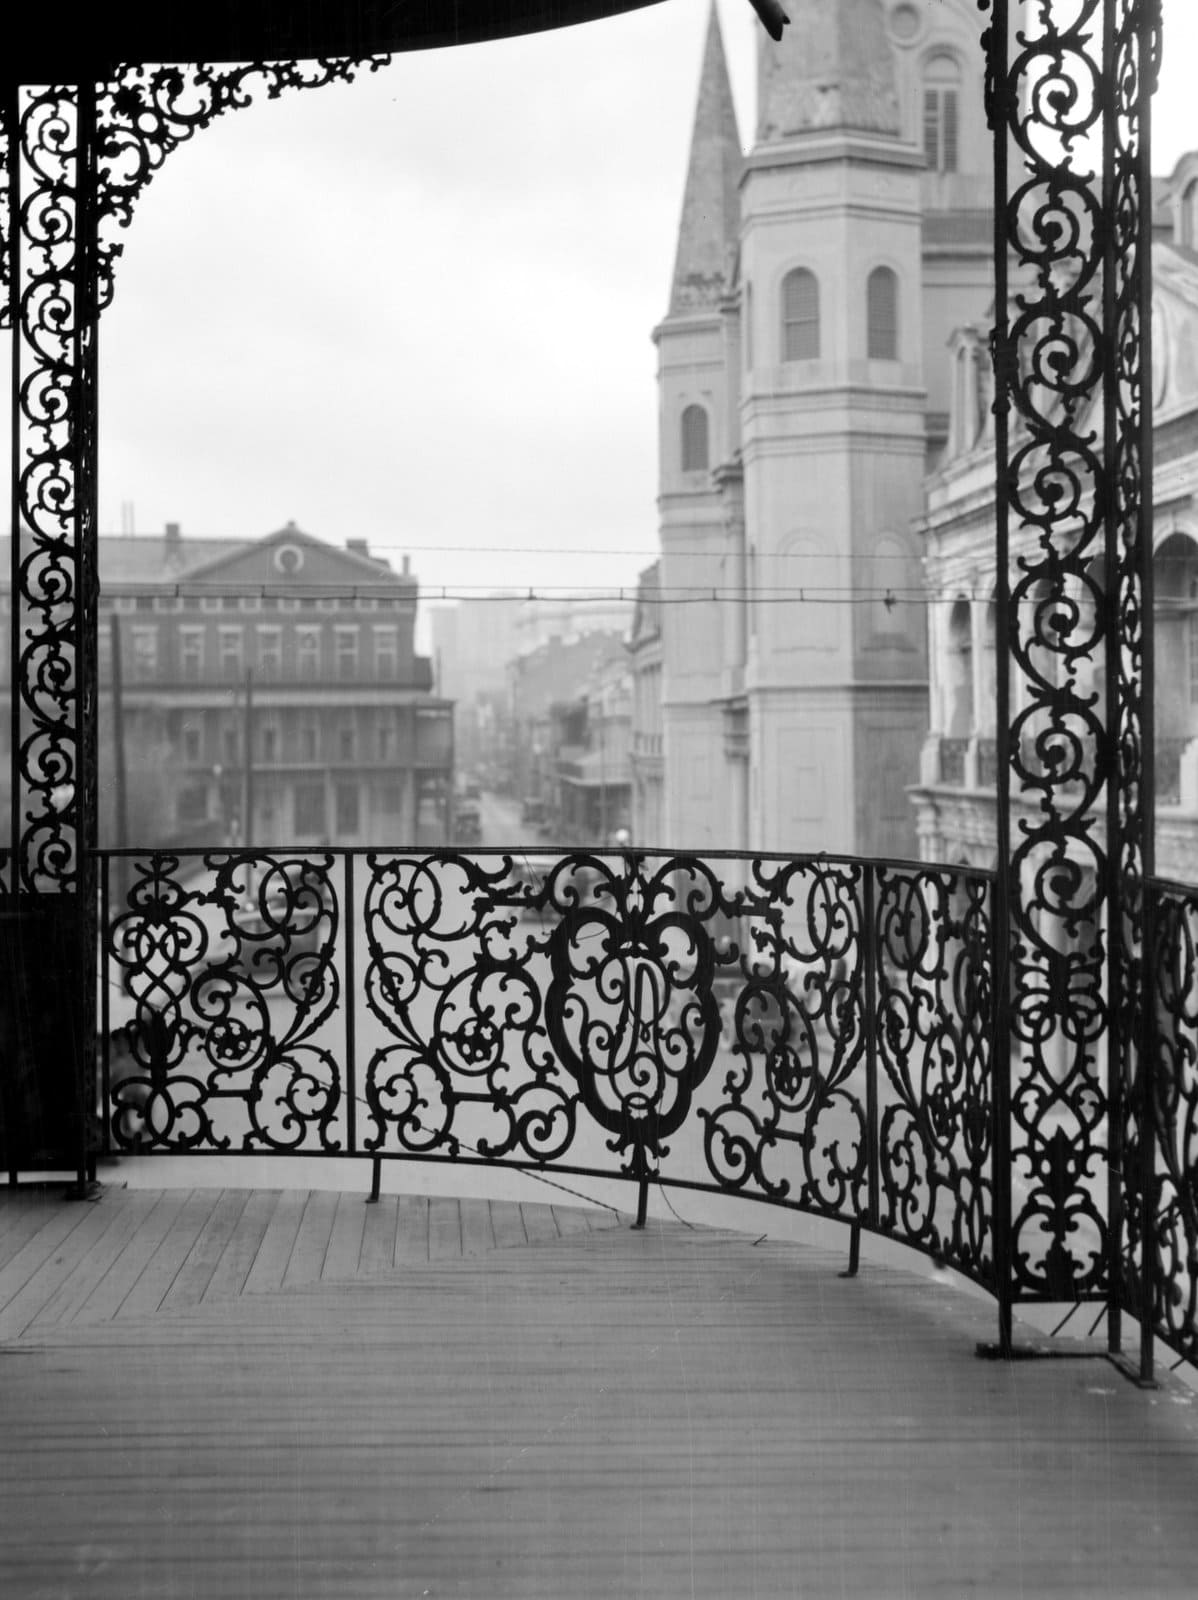 Vintage 1920s ironwork balcony - Pontalba buildings, New Orleans